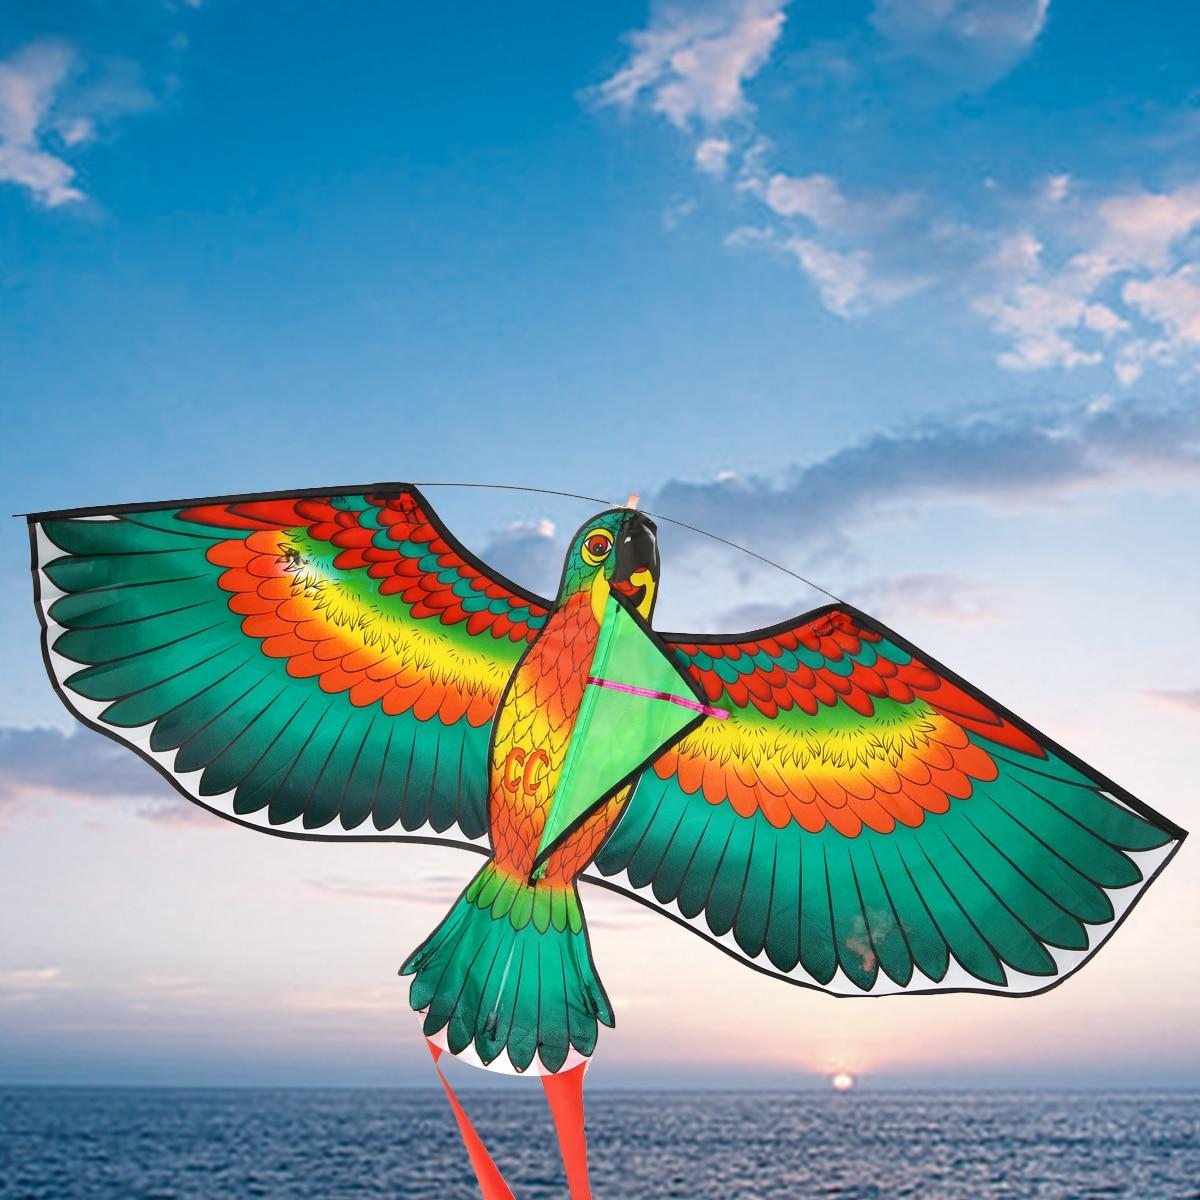 Colorful Parrot Kite Bird Kites Outdoor Kites Flying Toys Kite For Kids Gifts